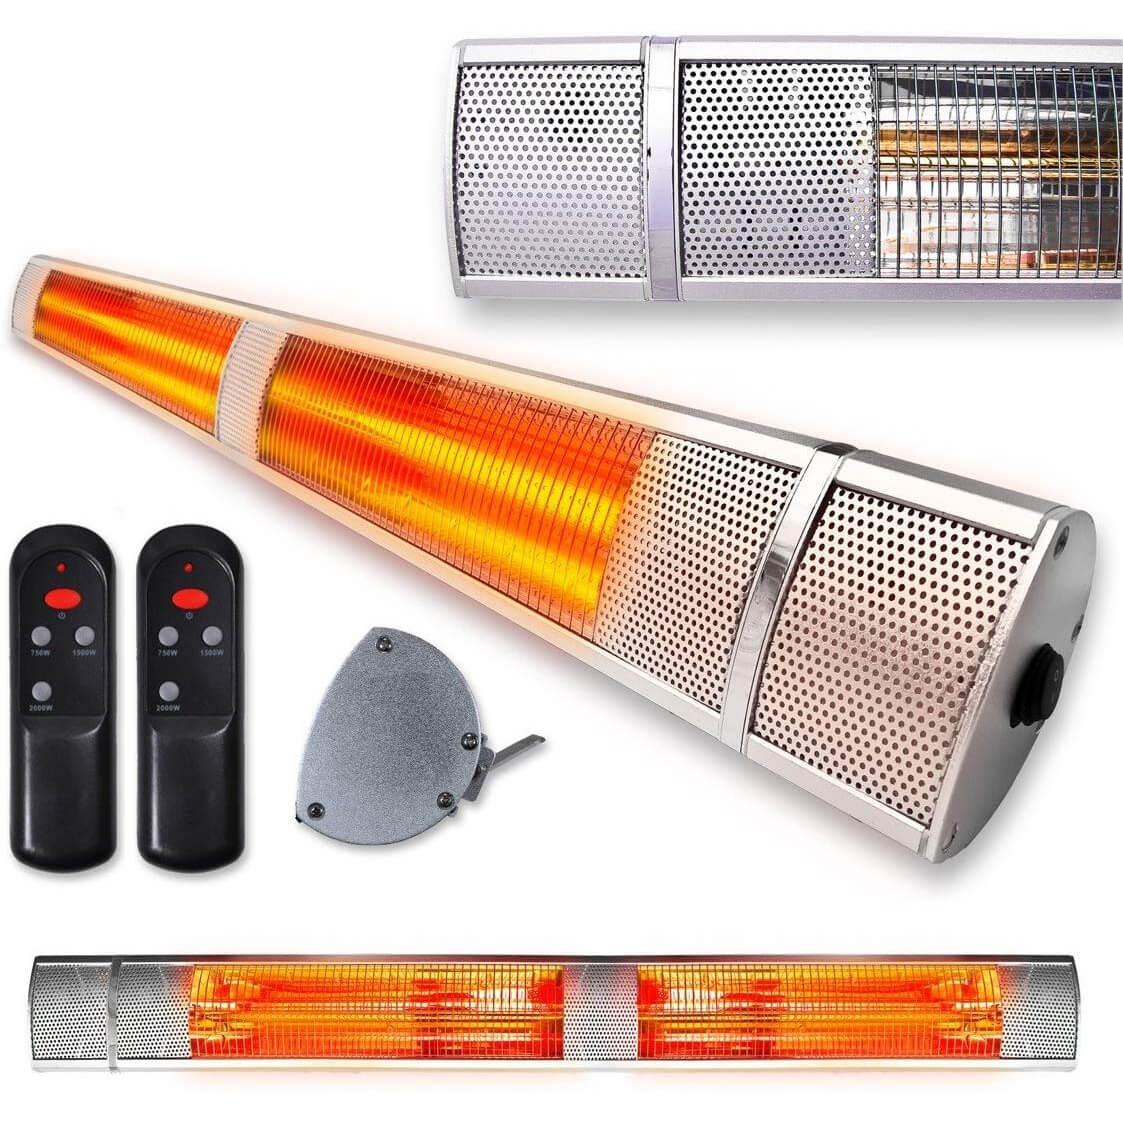 Best Bathroom Heaters For 2021 Heat Pump Source